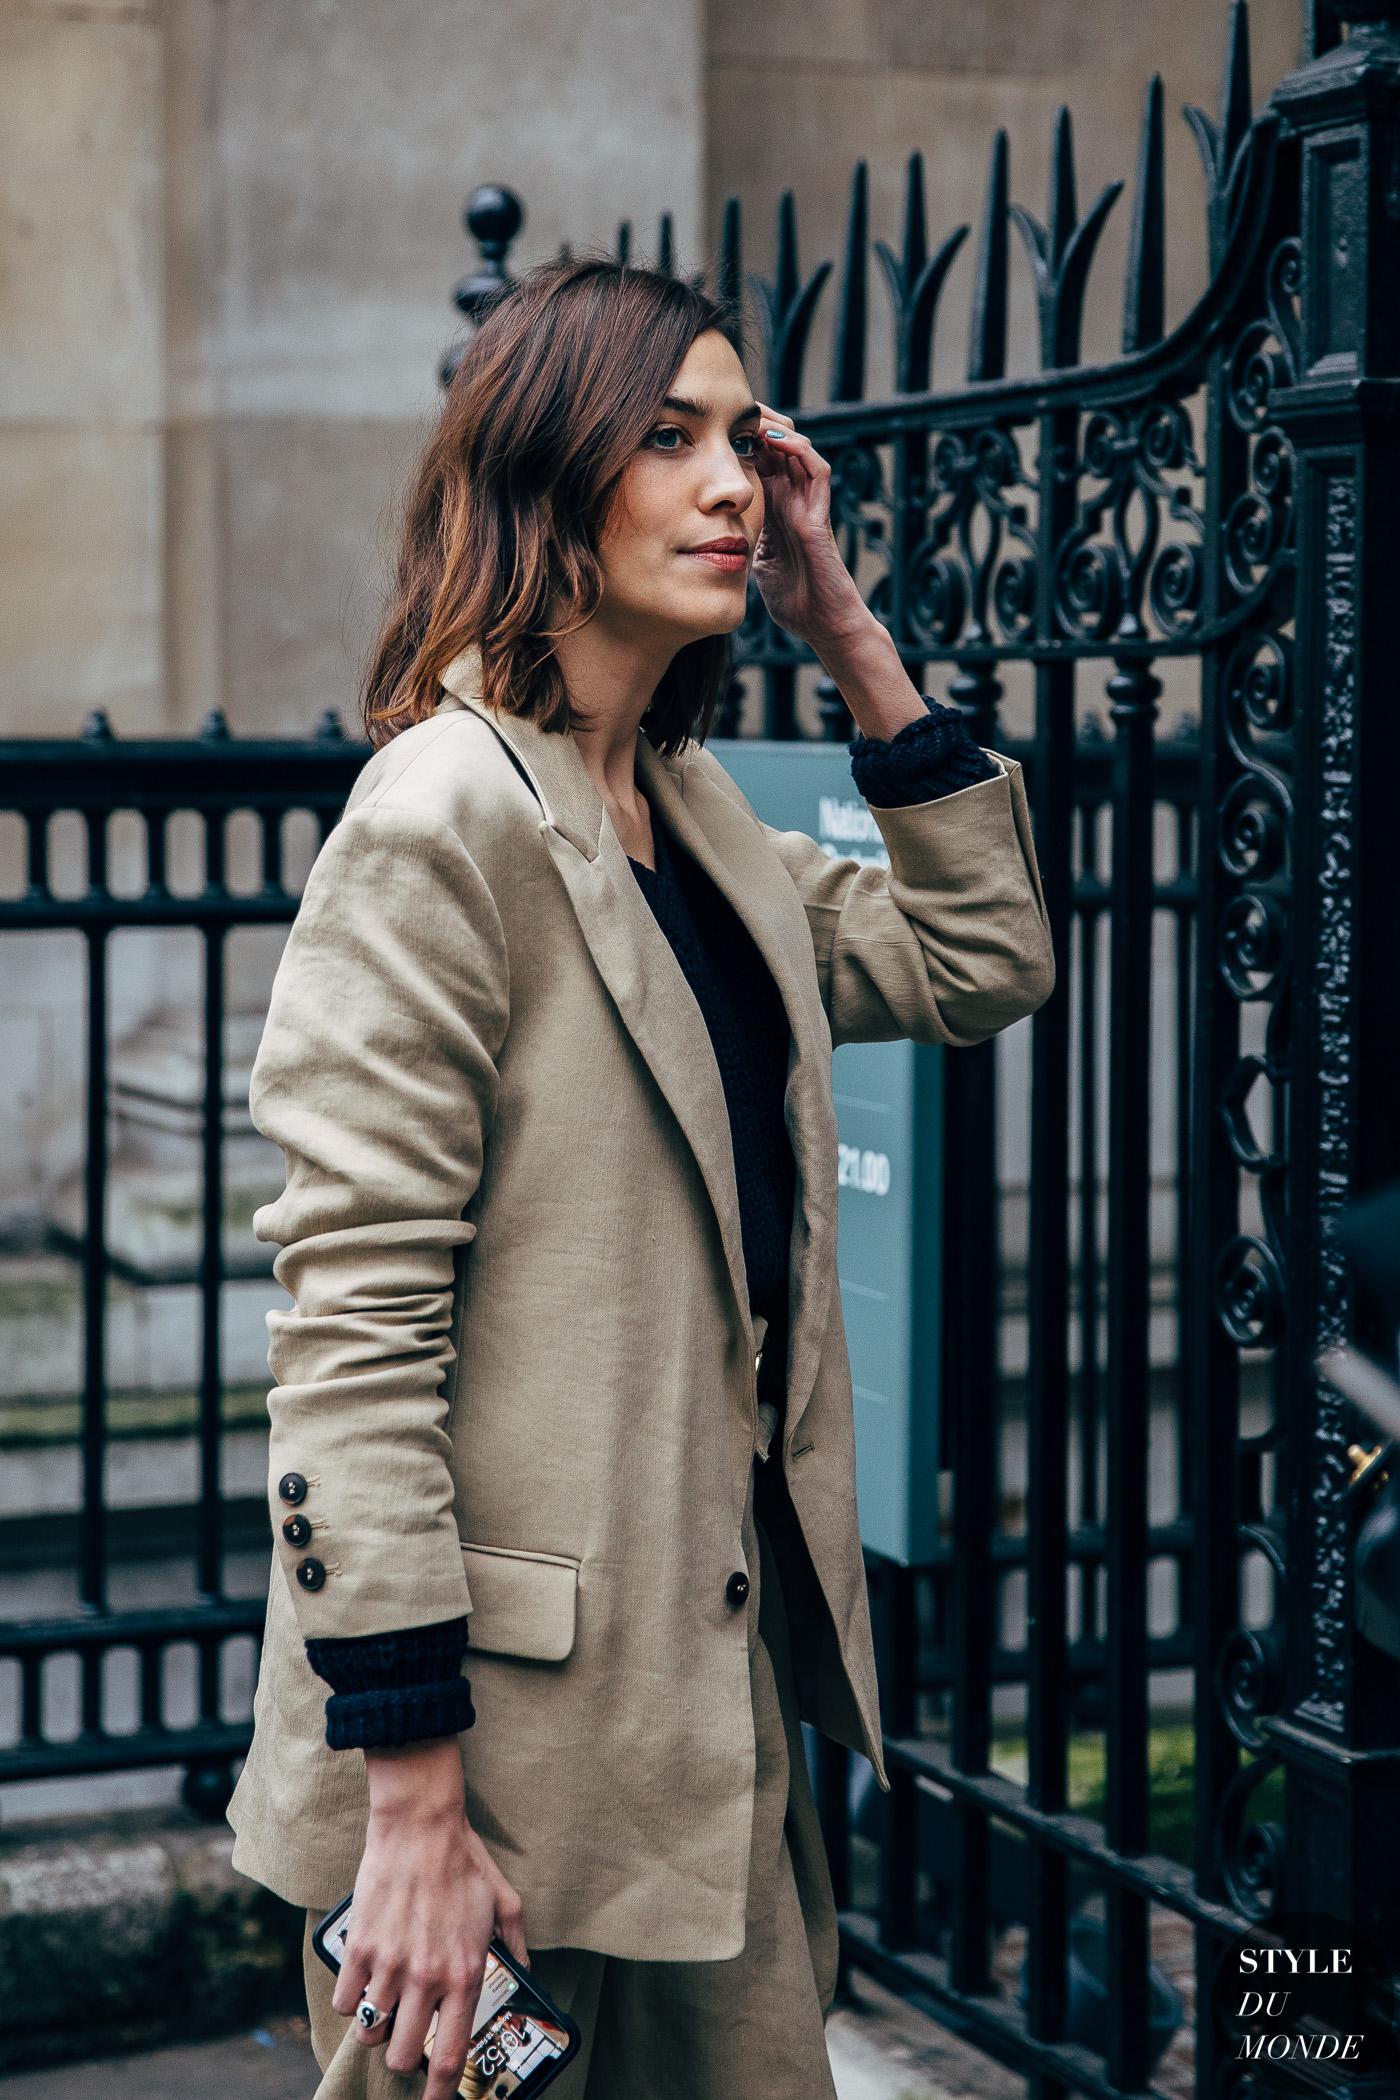 London FW 2019 Street Style: Alexa Chung - STYLE DU MONDE ...